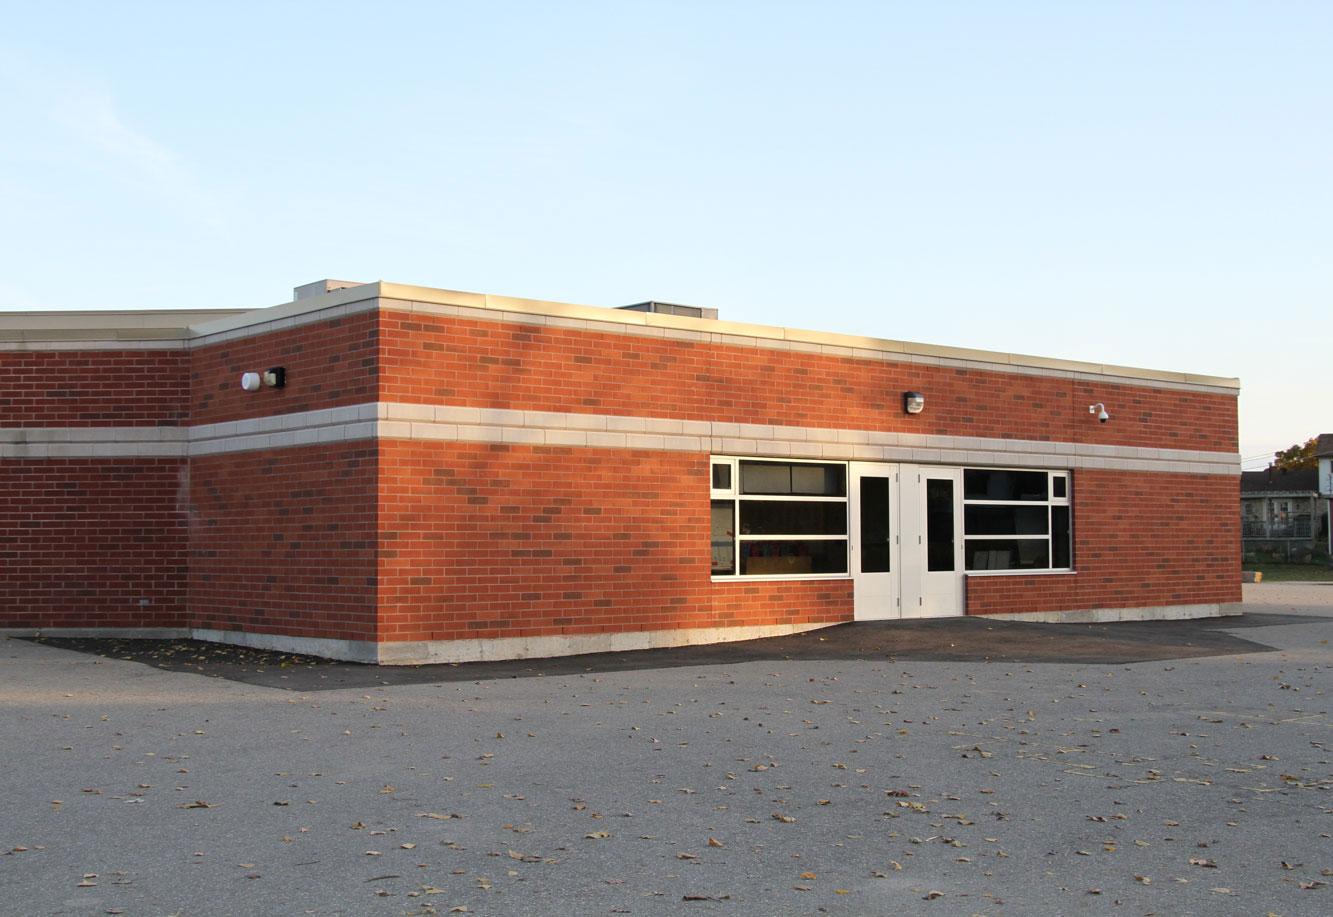 Our Lady Of Providence Catholic School